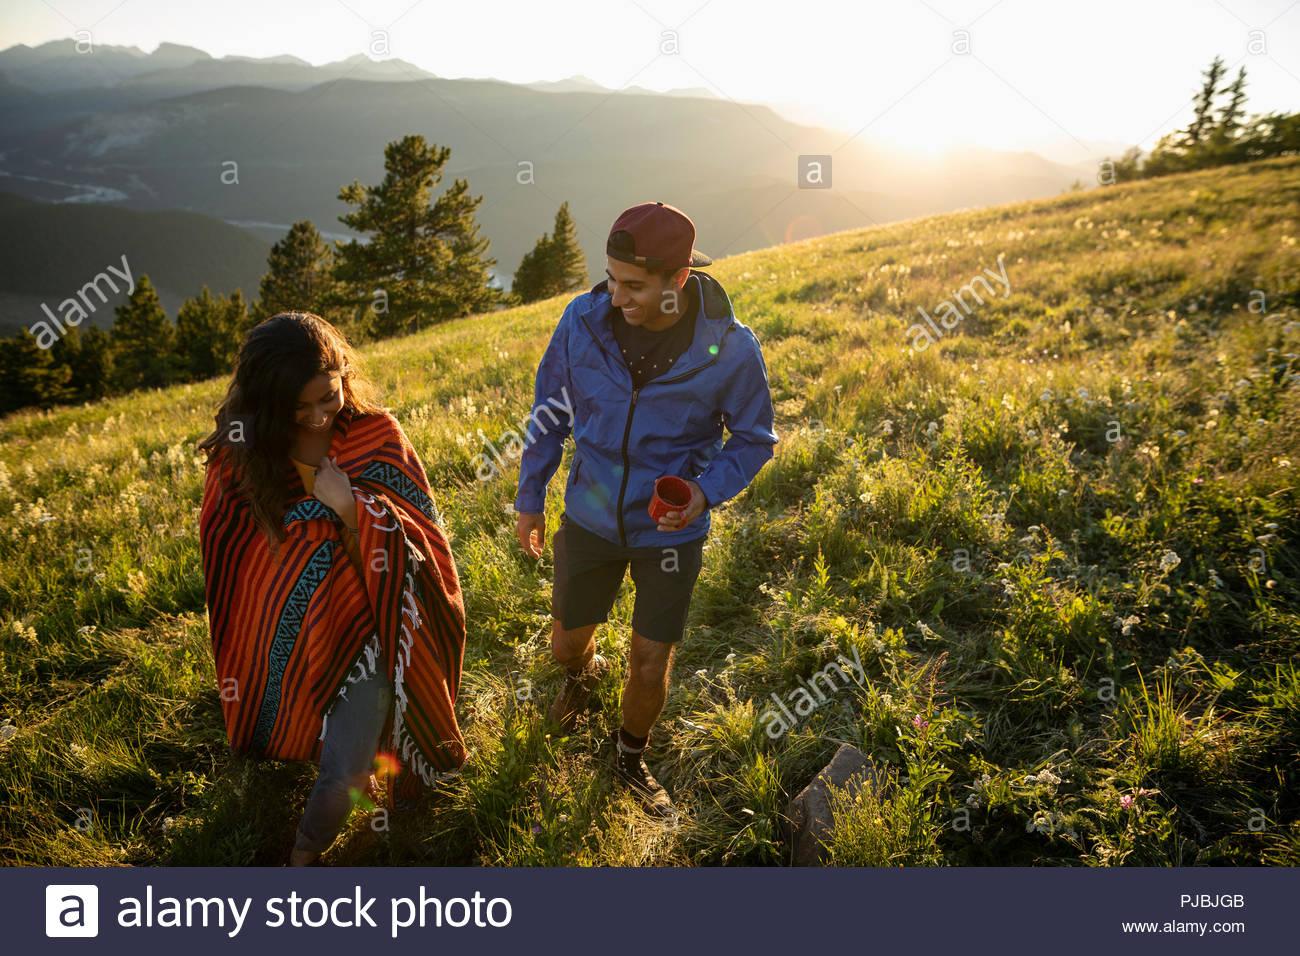 Couple with coffee and blanket walking on sunny, idyllic mountain hillside, Alberta, Canada - Stock Image